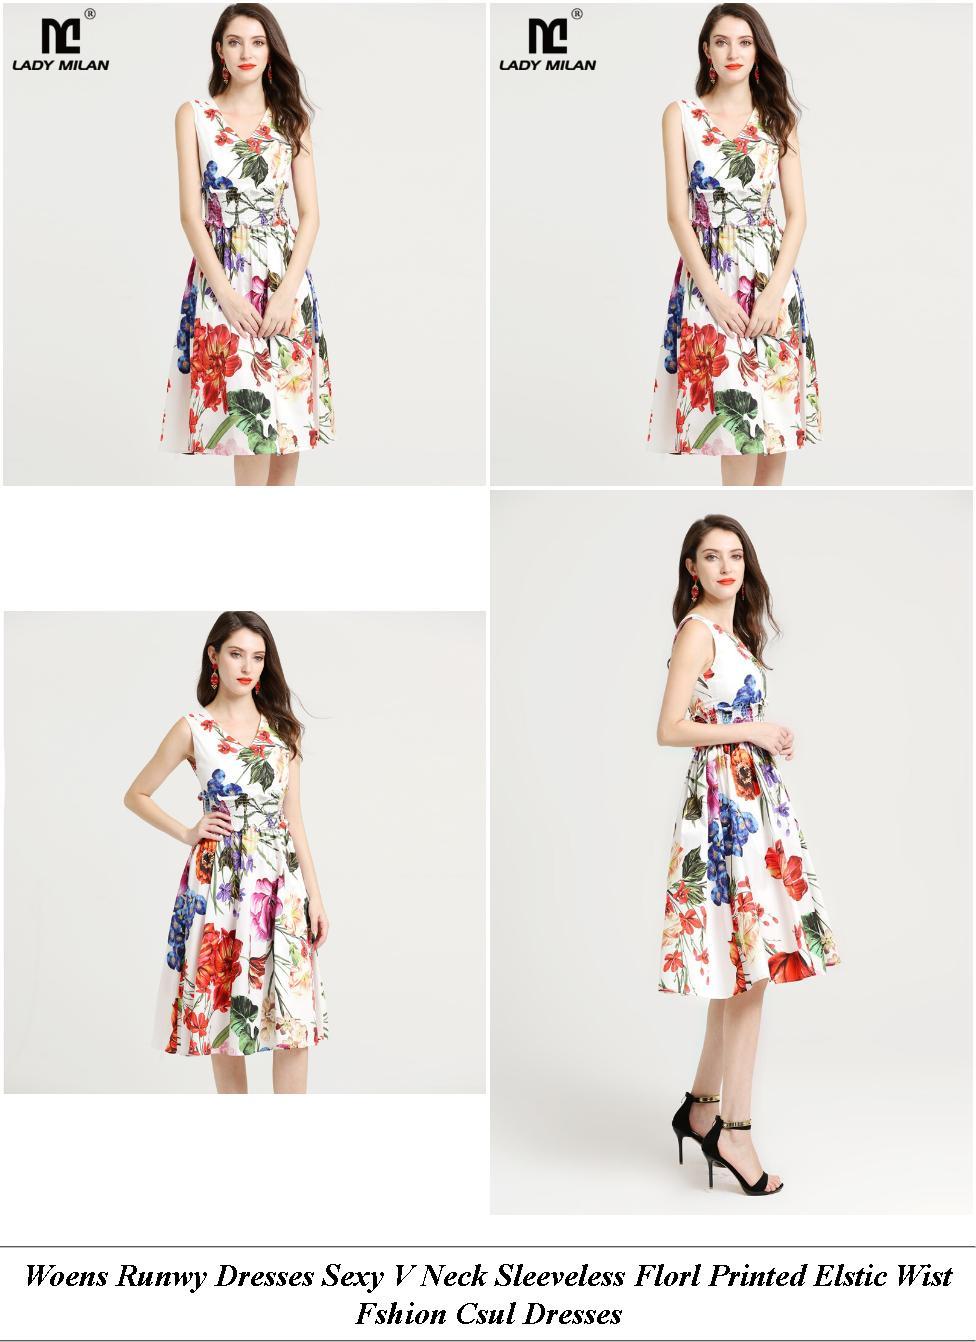 Est Prom Dress Shops In Nashville Tn - Makeup On Sale Online - Mini Dressing Ikea